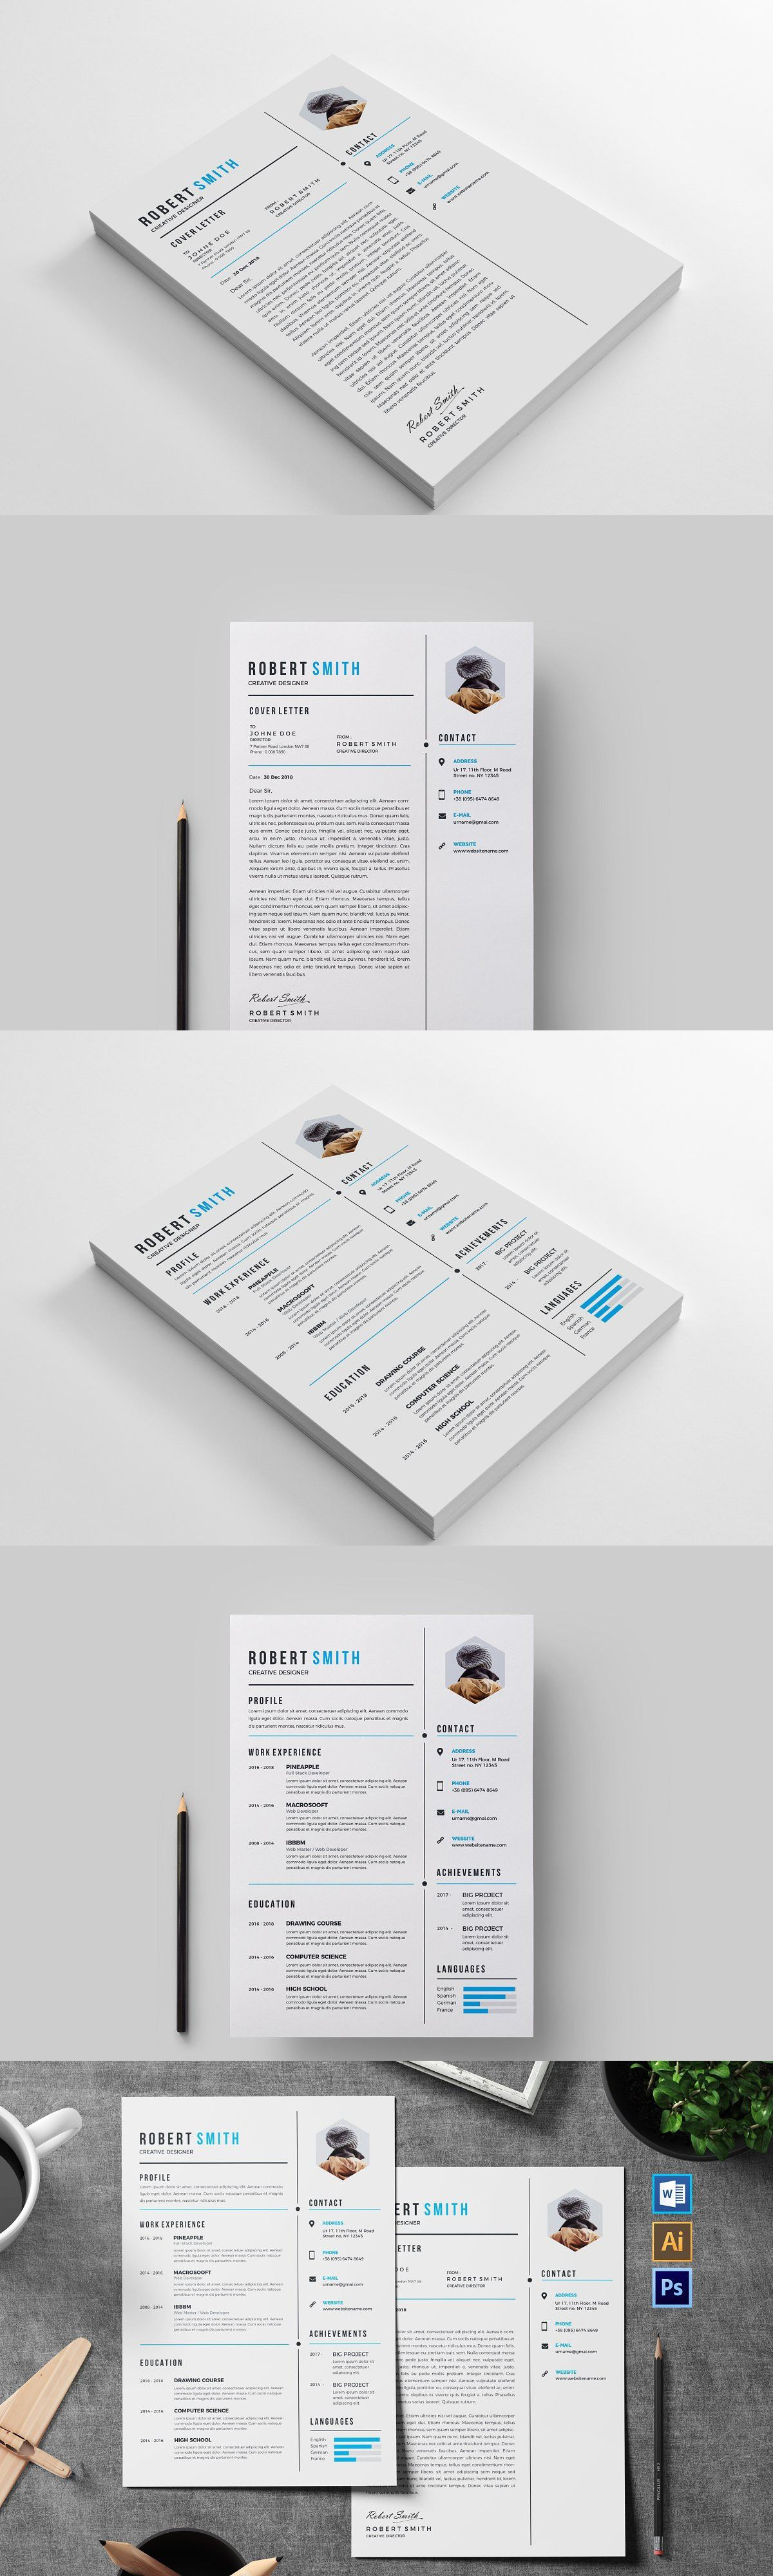 Resume Simple resume template, Resume, Resume templates